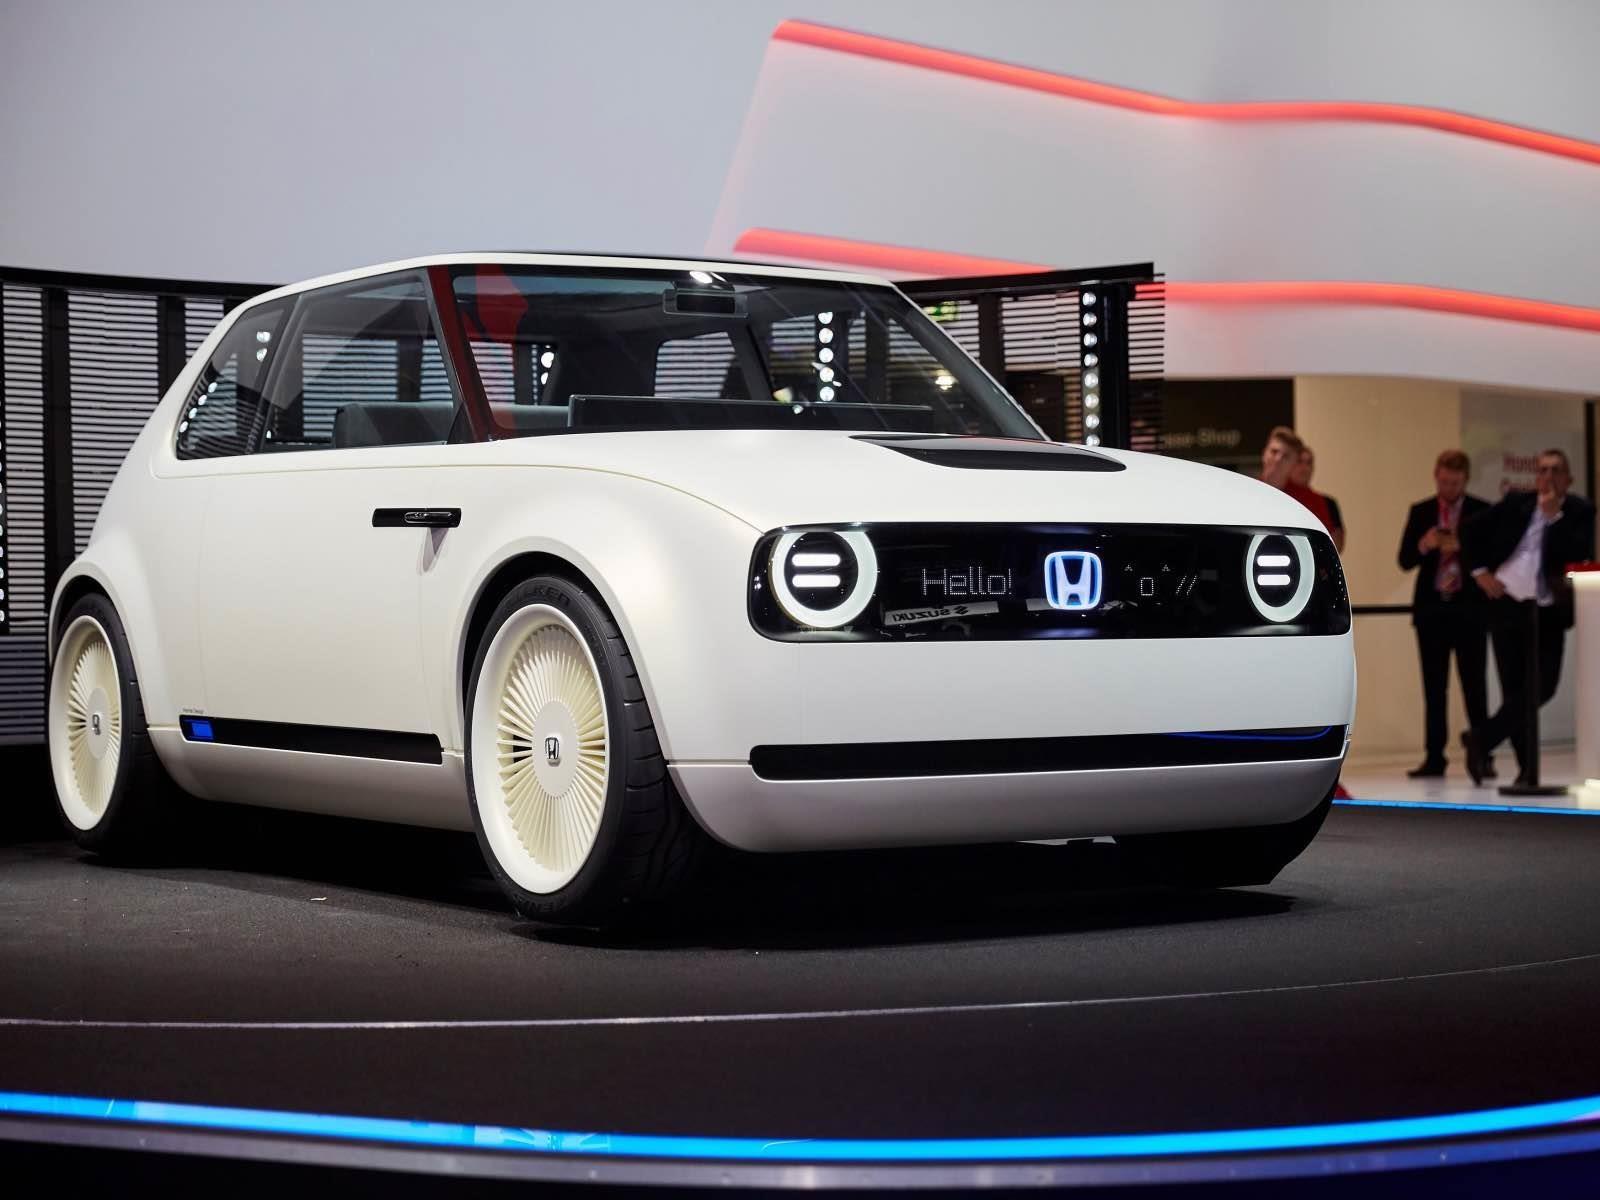 Honda Urban EV un propositivo eléctrico japonés